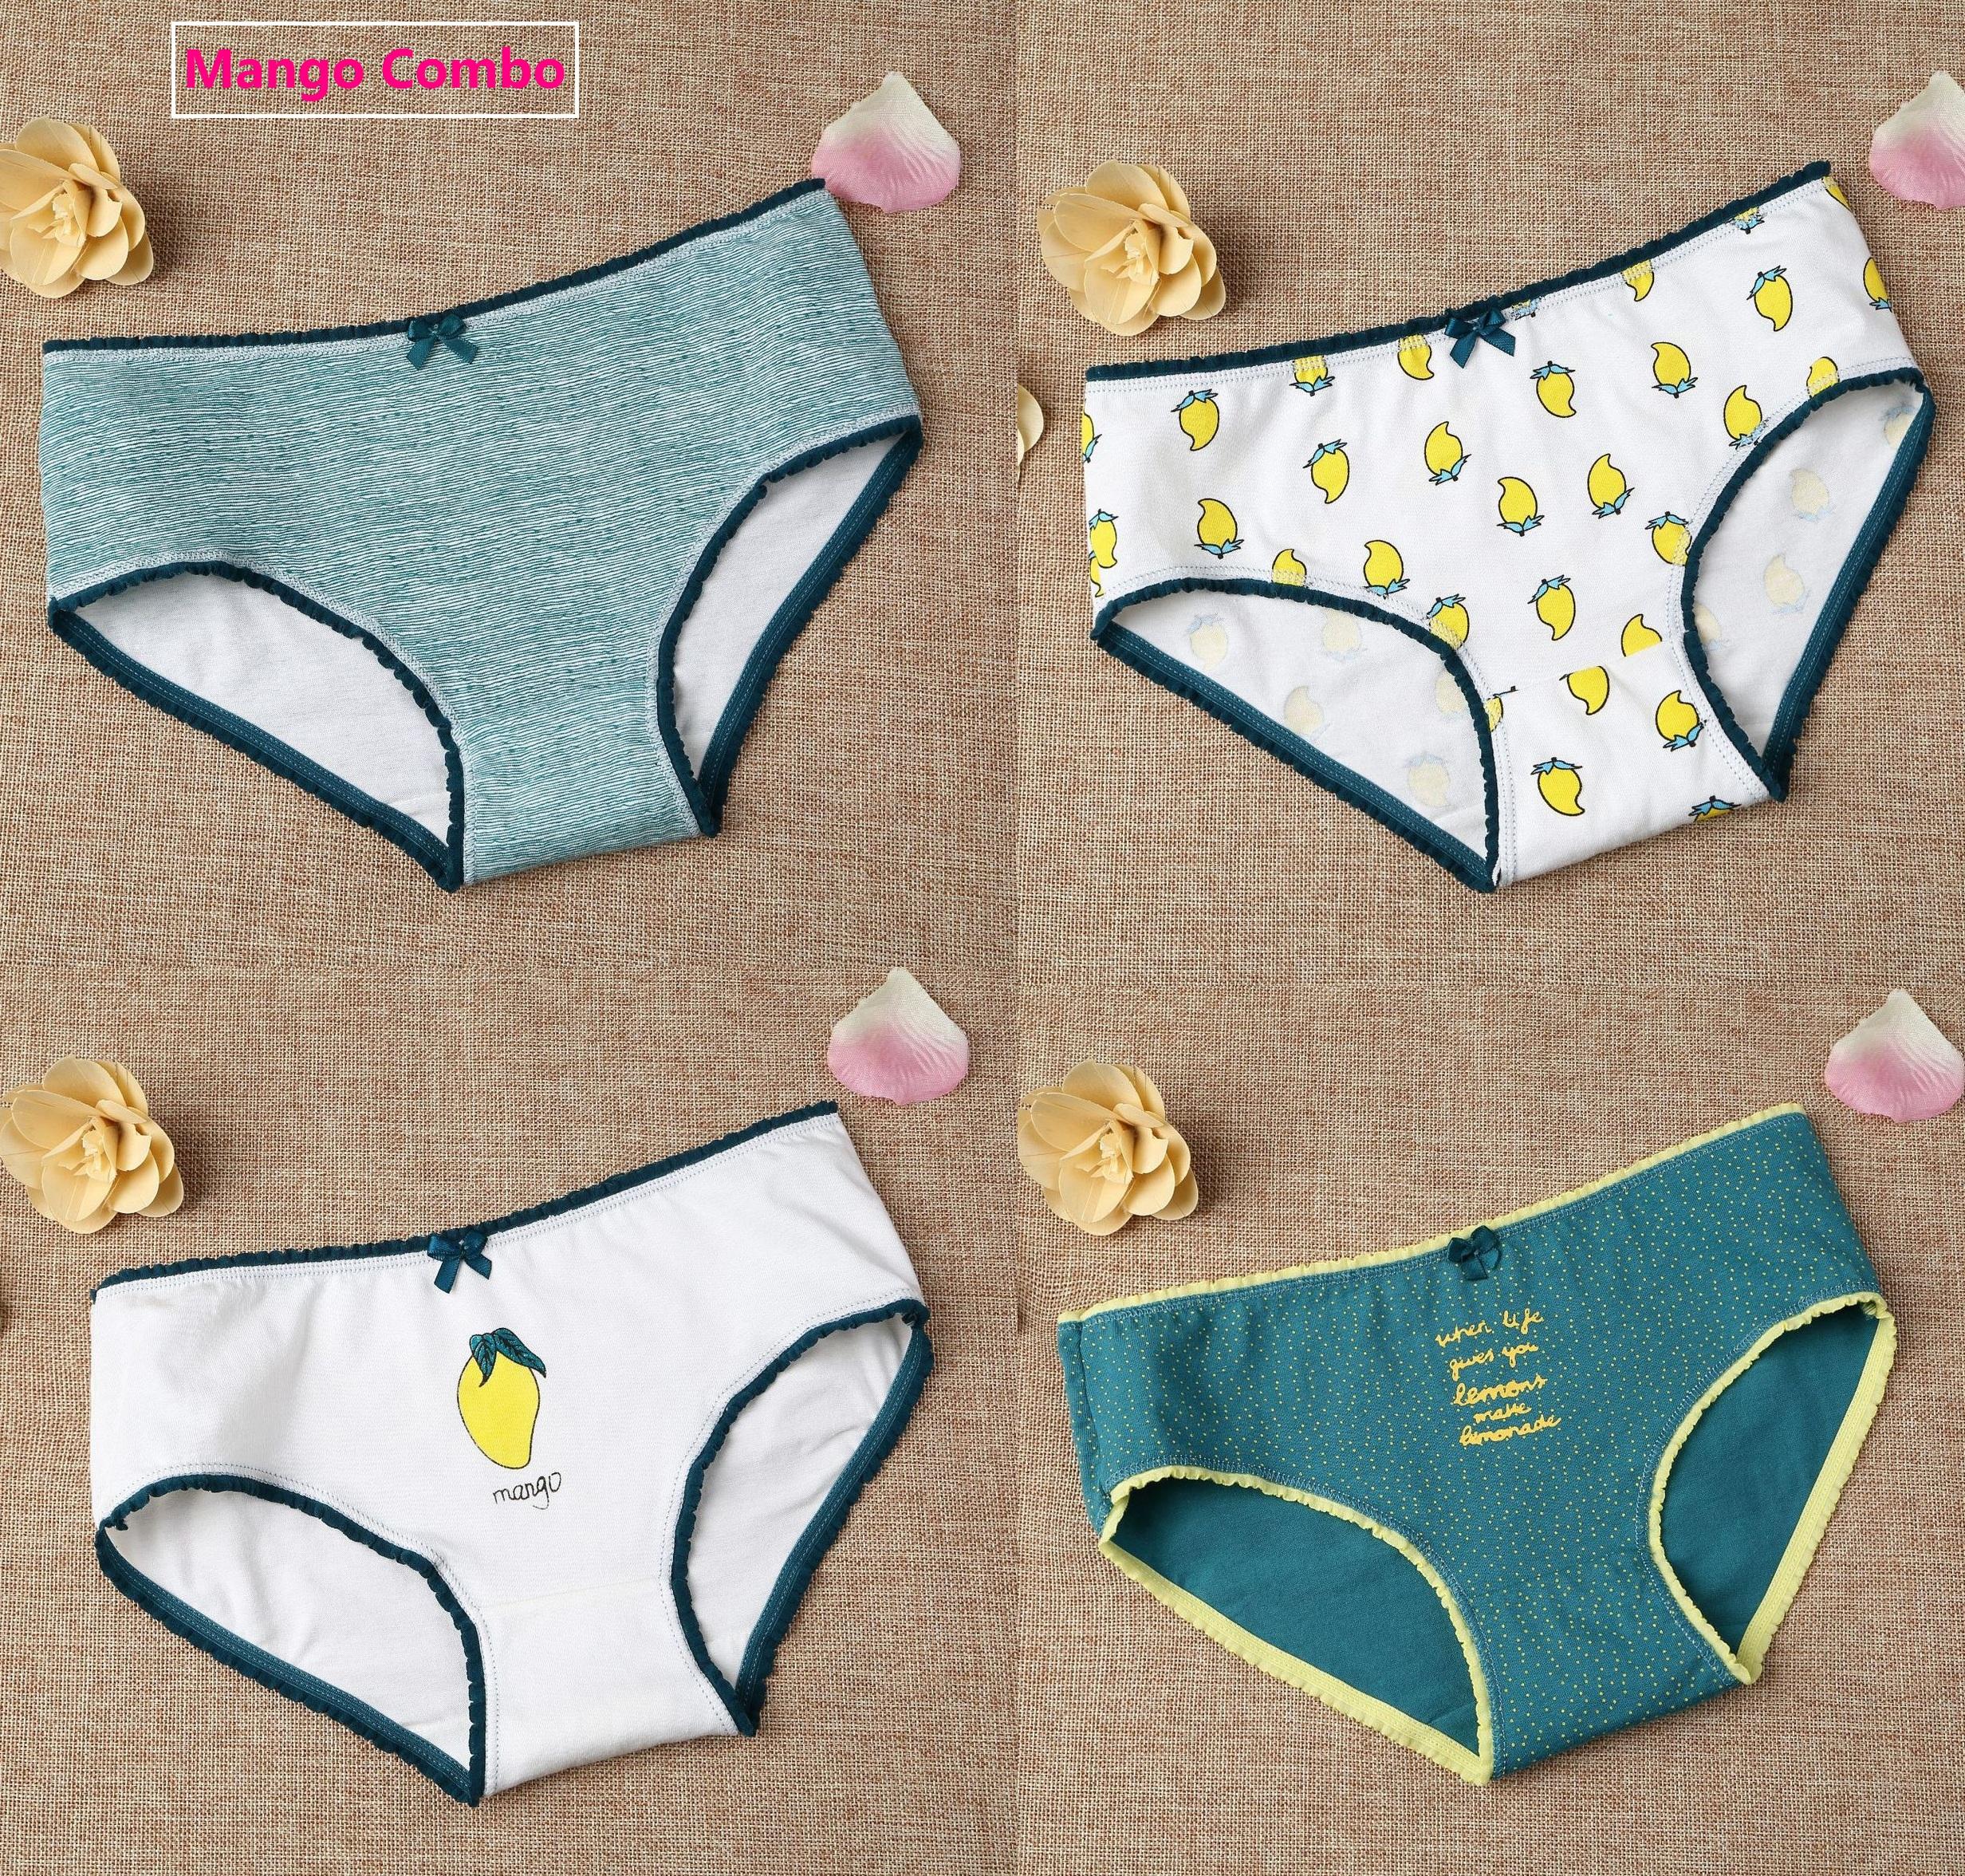 b0aa7af24b9acd China women underwear briefs wholesale 🇨🇳 - Alibaba